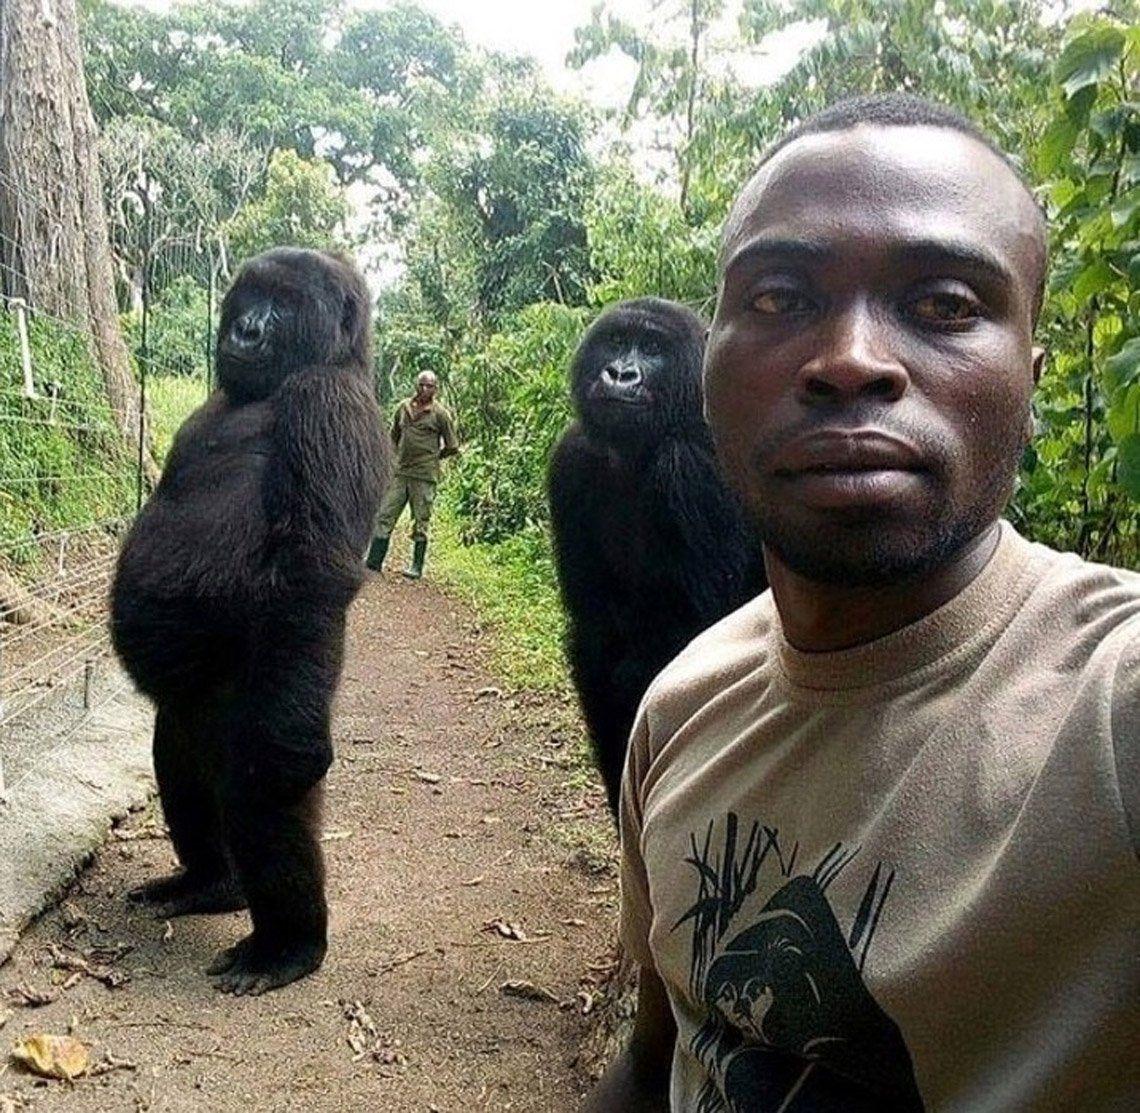 Las increíbles selfies de un guardaparque con gorilas que posan como humanos